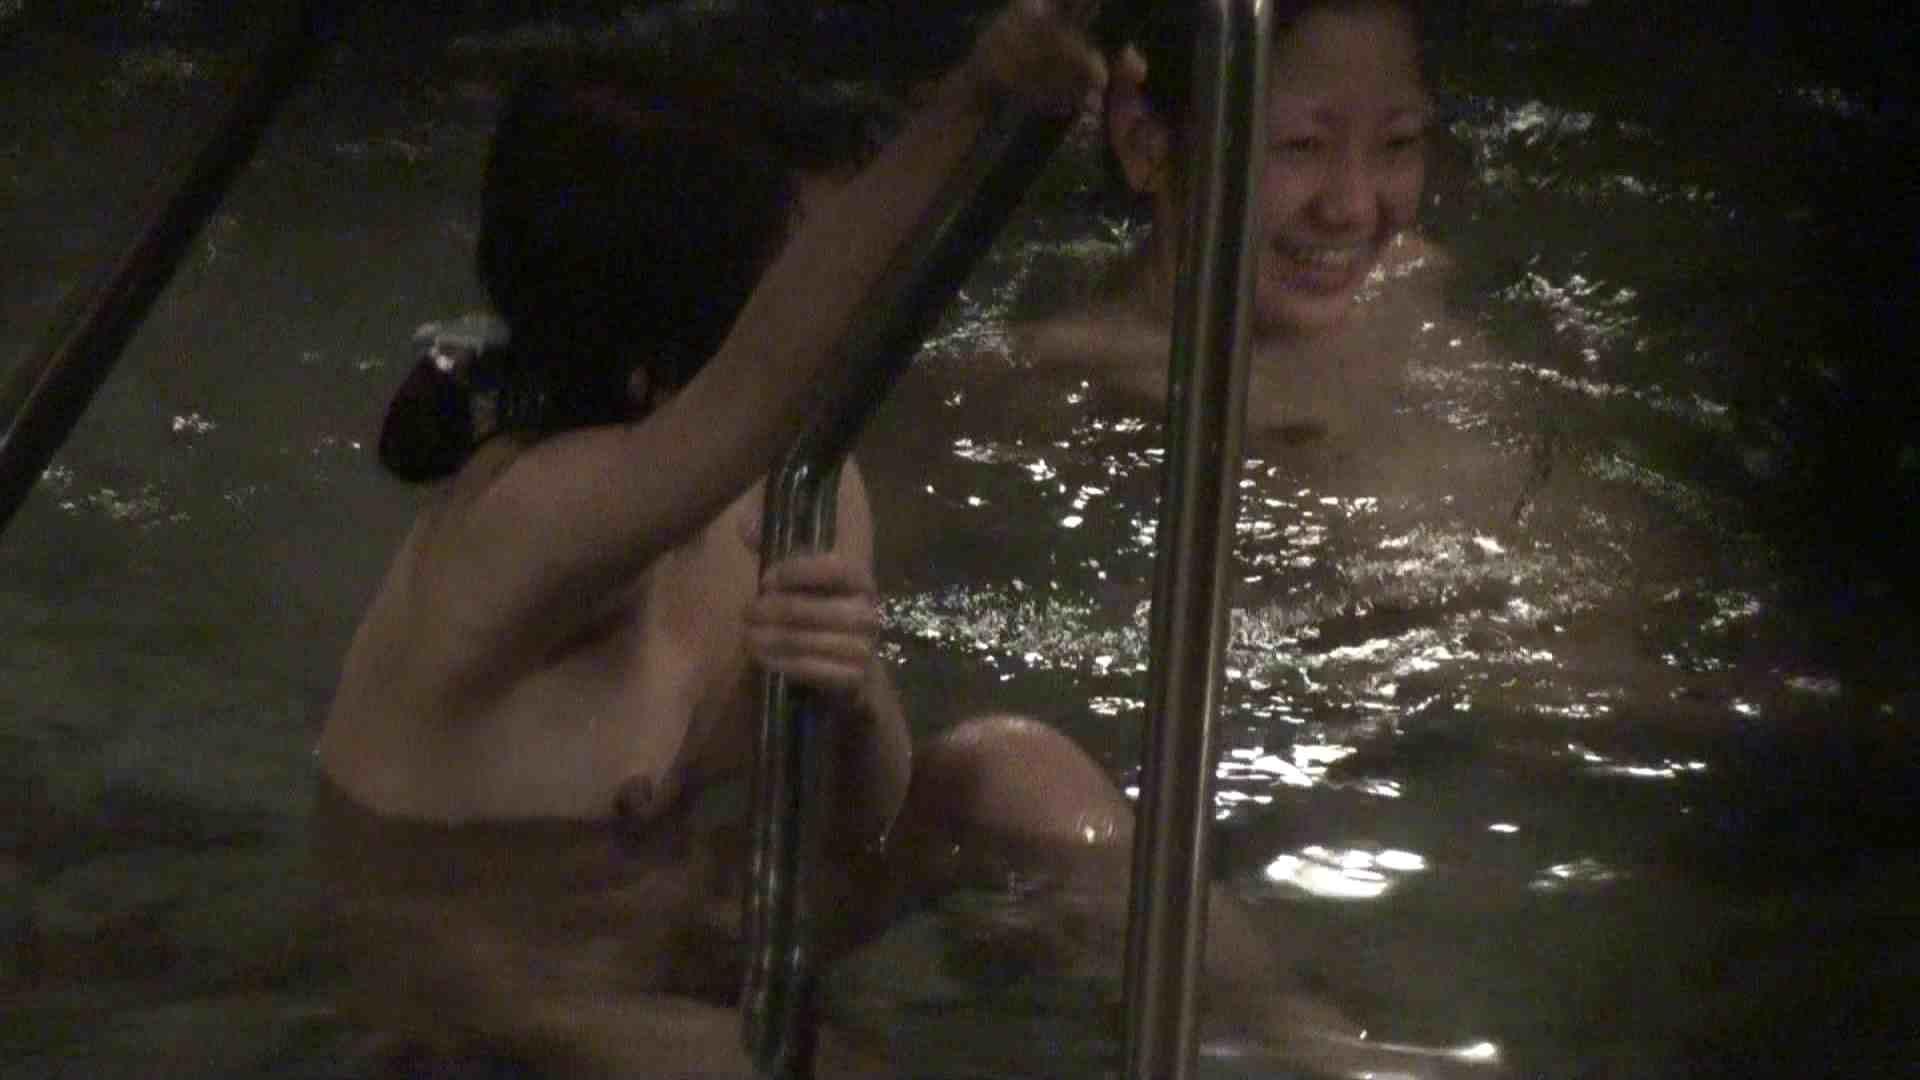 Aquaな露天風呂Vol.422 盗撮映像  61Pix 5